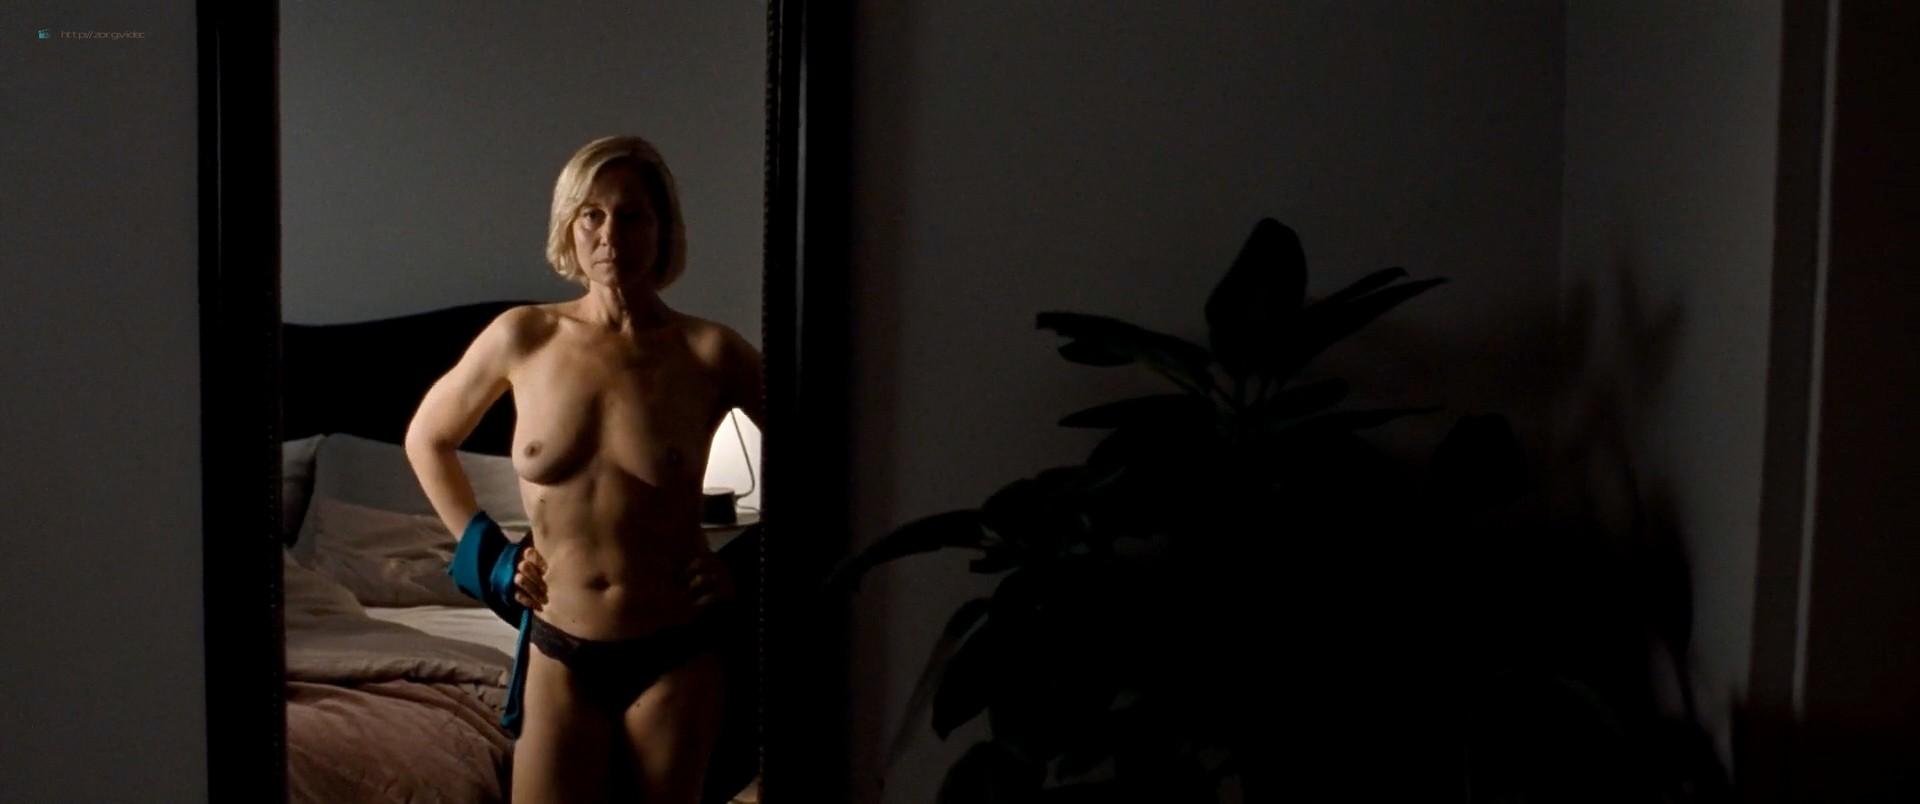 Trine Dyrholm nude explicit blow job and hot sex - Queen of Hearts (DK-2019) 1080p WEB (12)